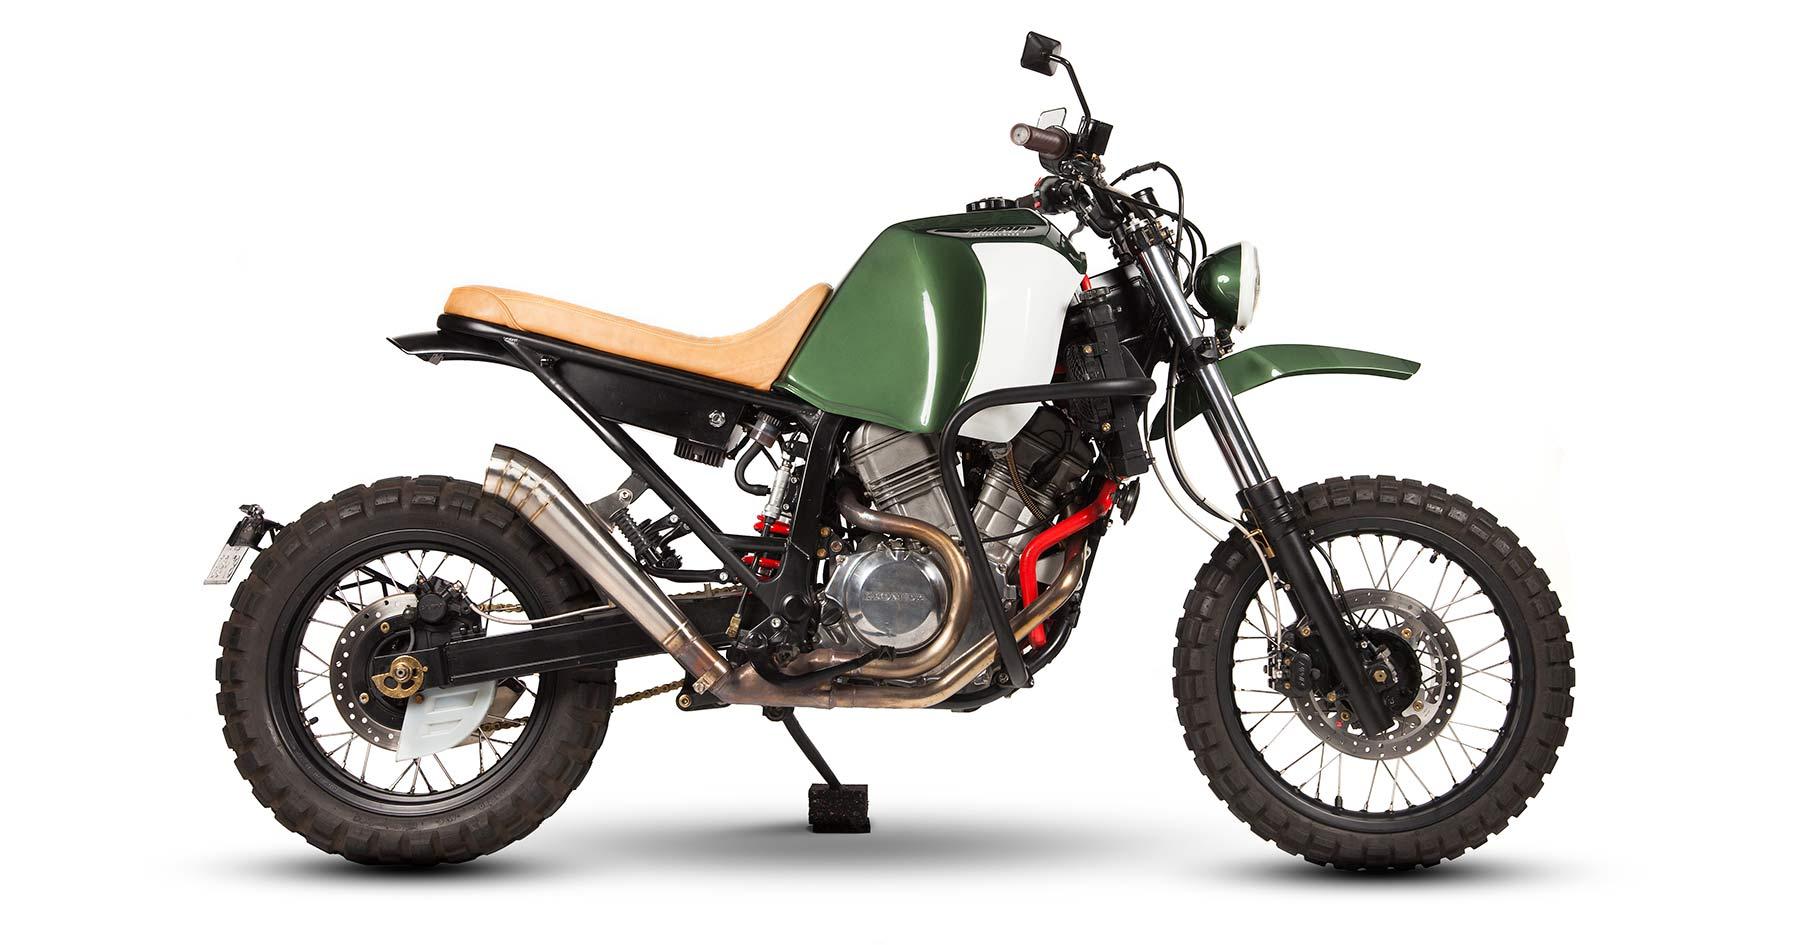 Kalahari A Custom Africa Twin From Maria Motorcycles Bike Exif